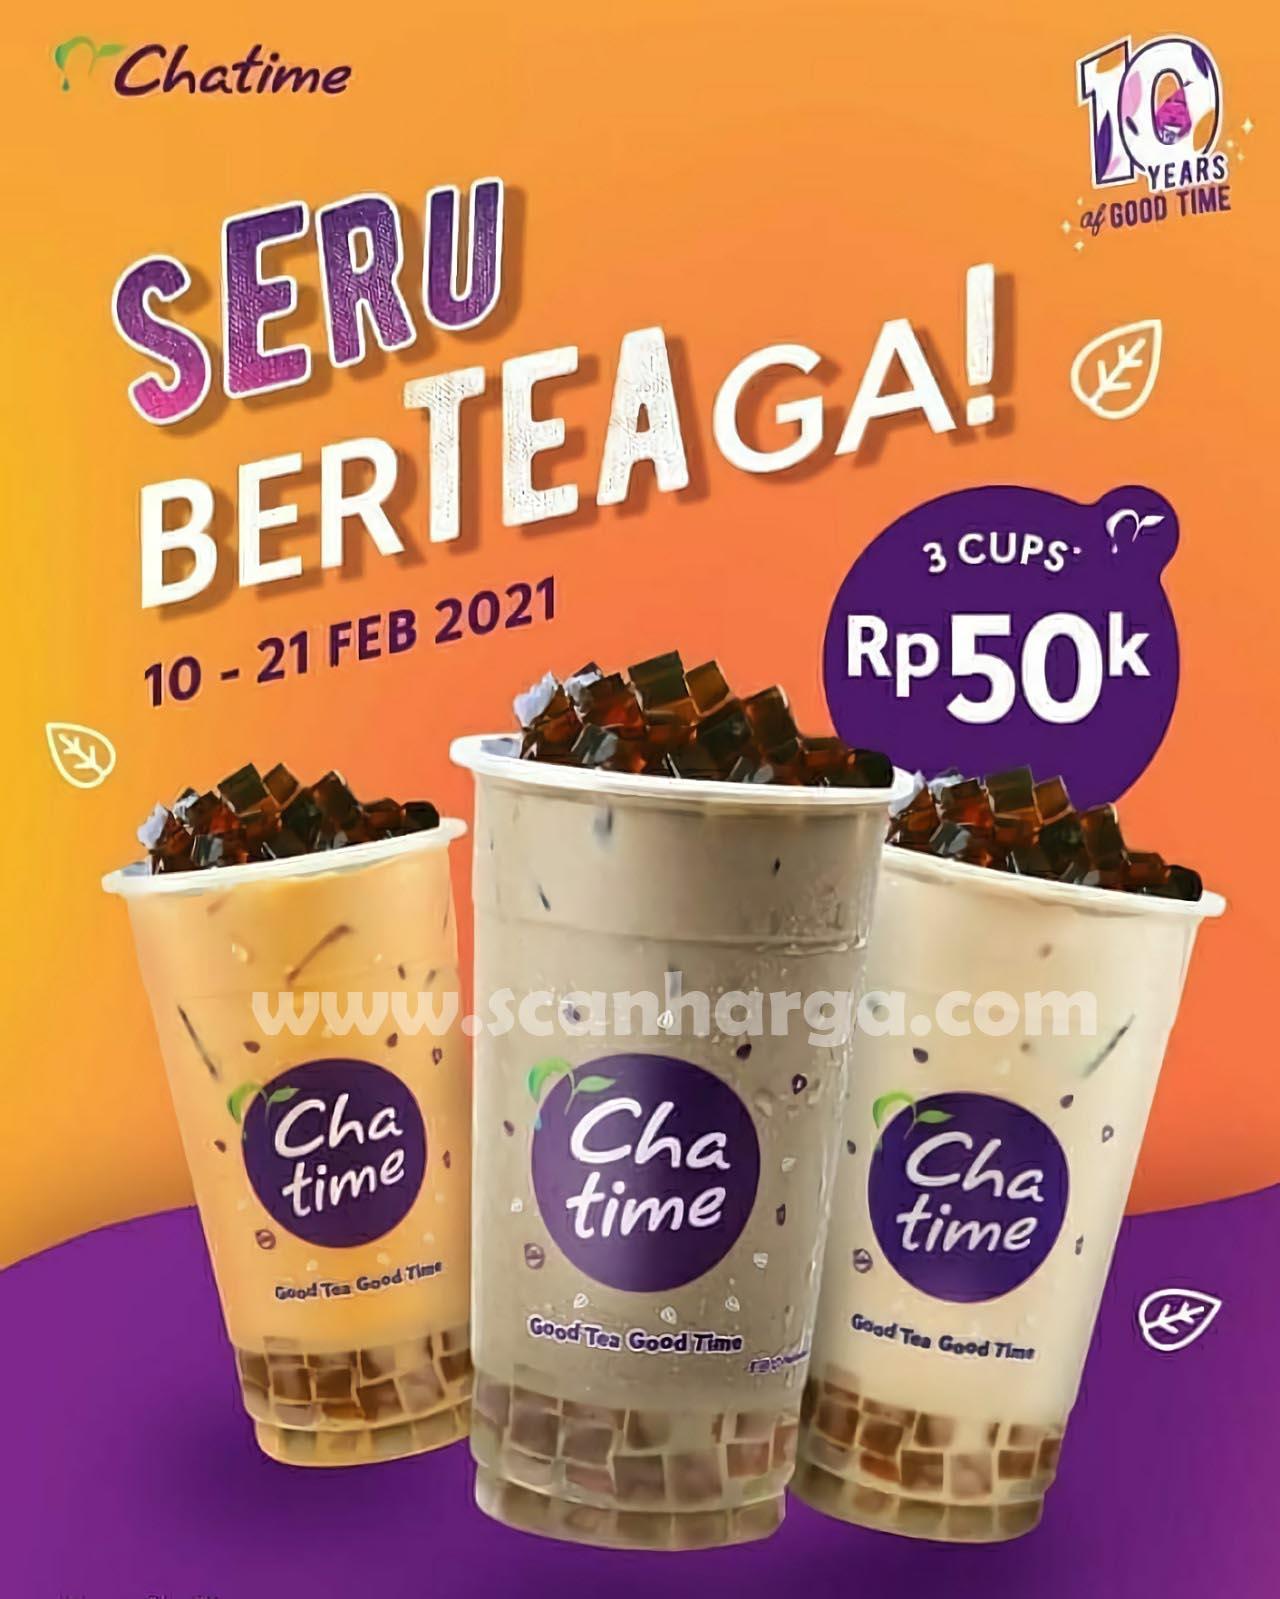 CHATIME Promo SERU BERTEAGA! Harga 3 Cup Chatime cuma Rp 50K